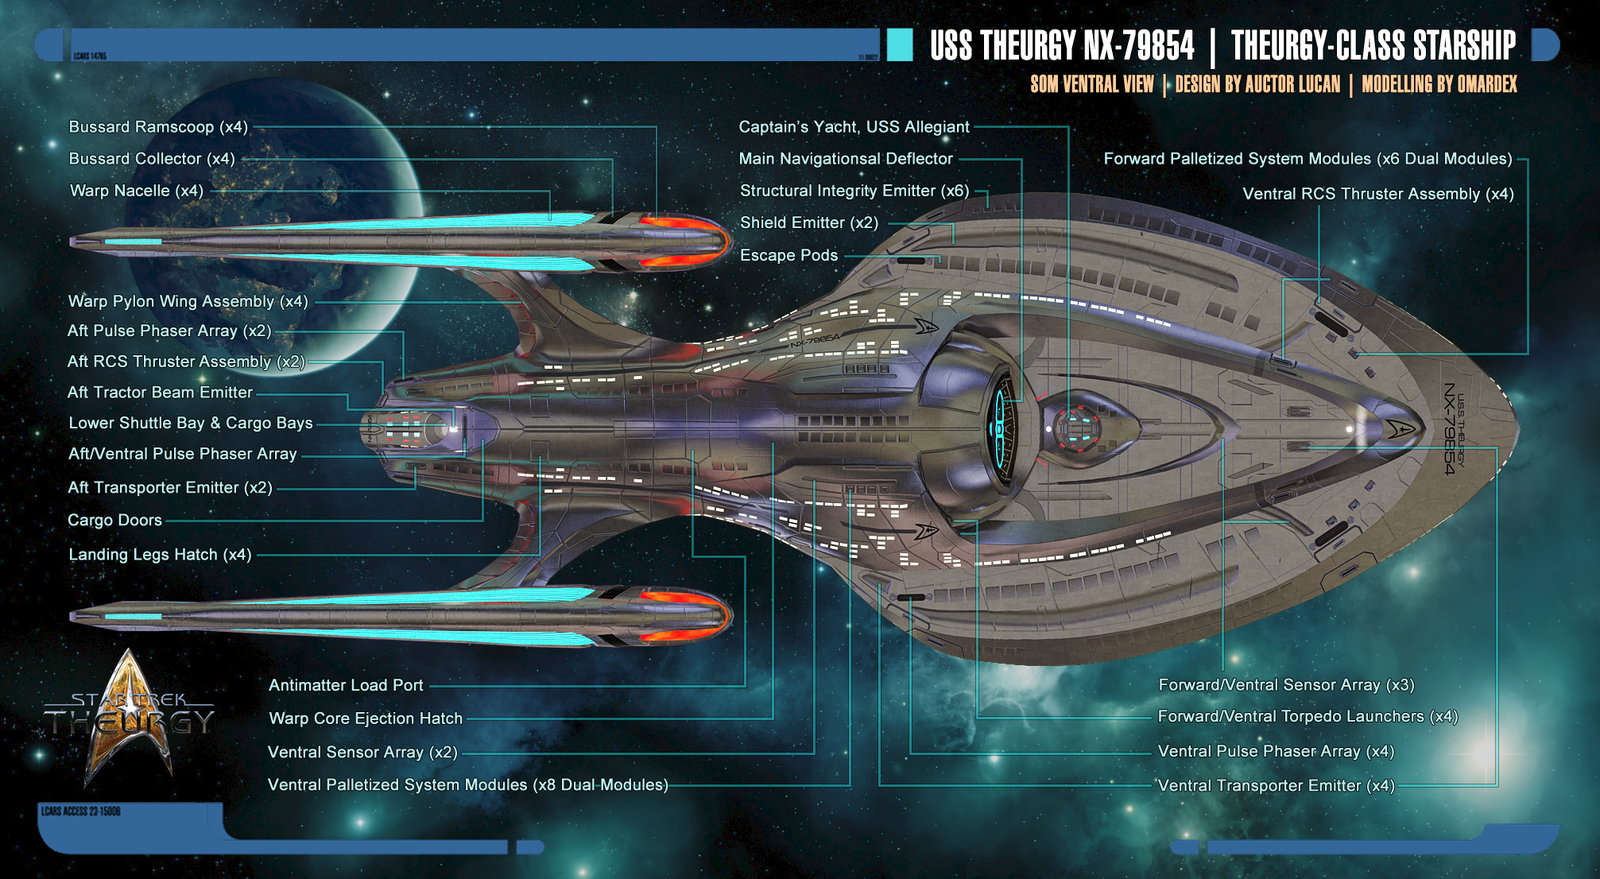 theurgy_class_starship_schematics___vent